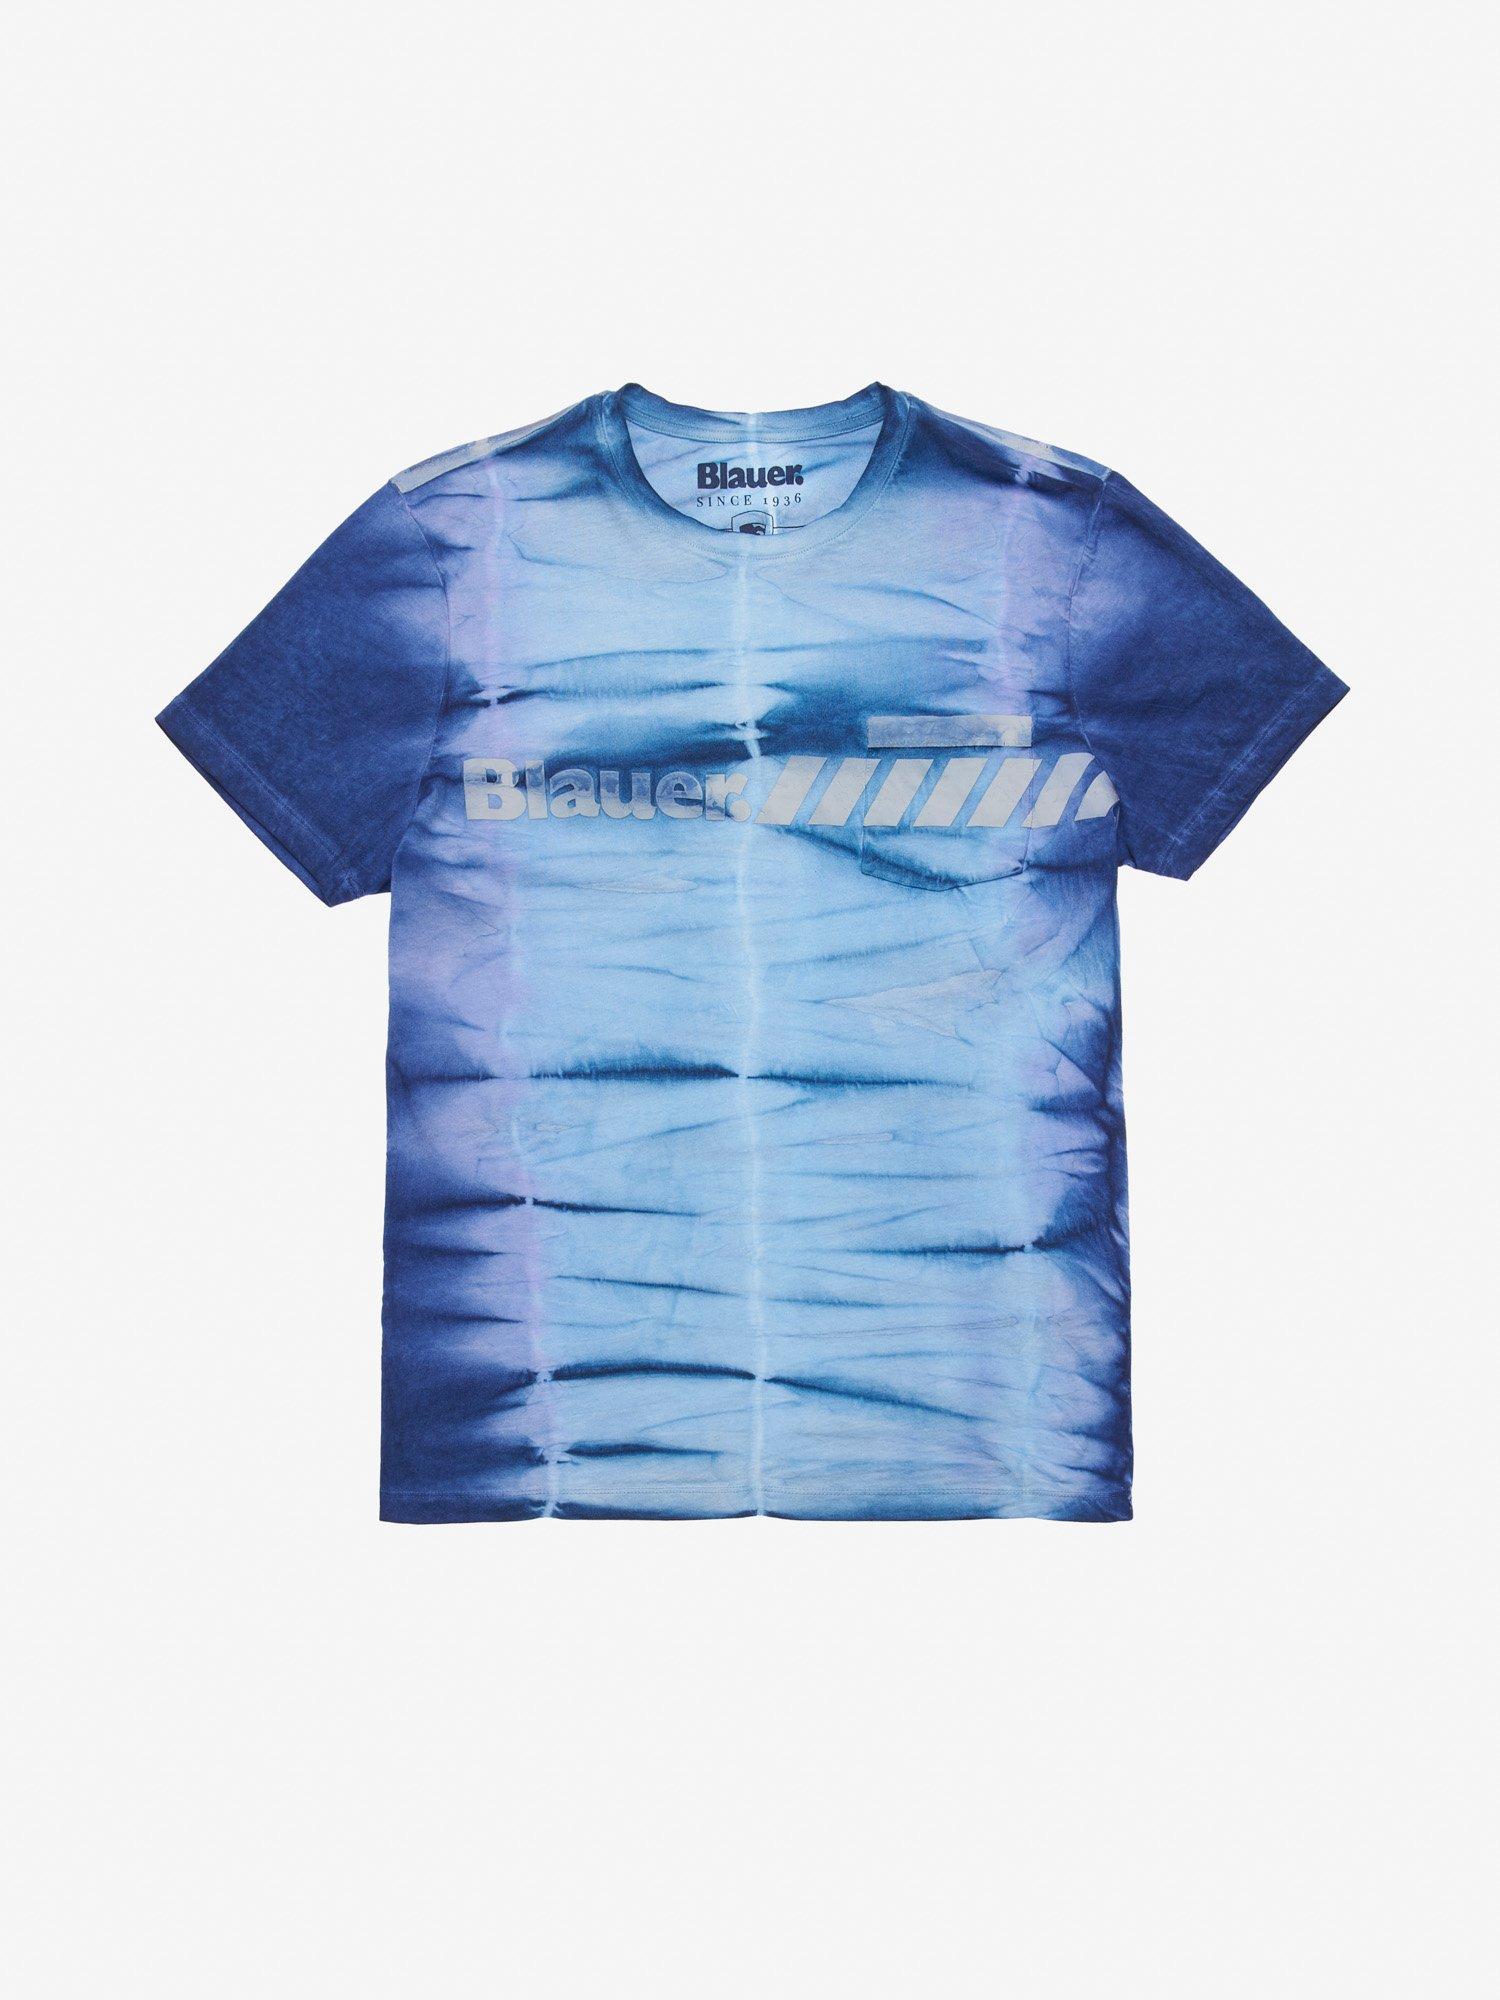 Blauer - MEN'S TIE DYE T-SHIRT - Ultramarine Blue - Blauer